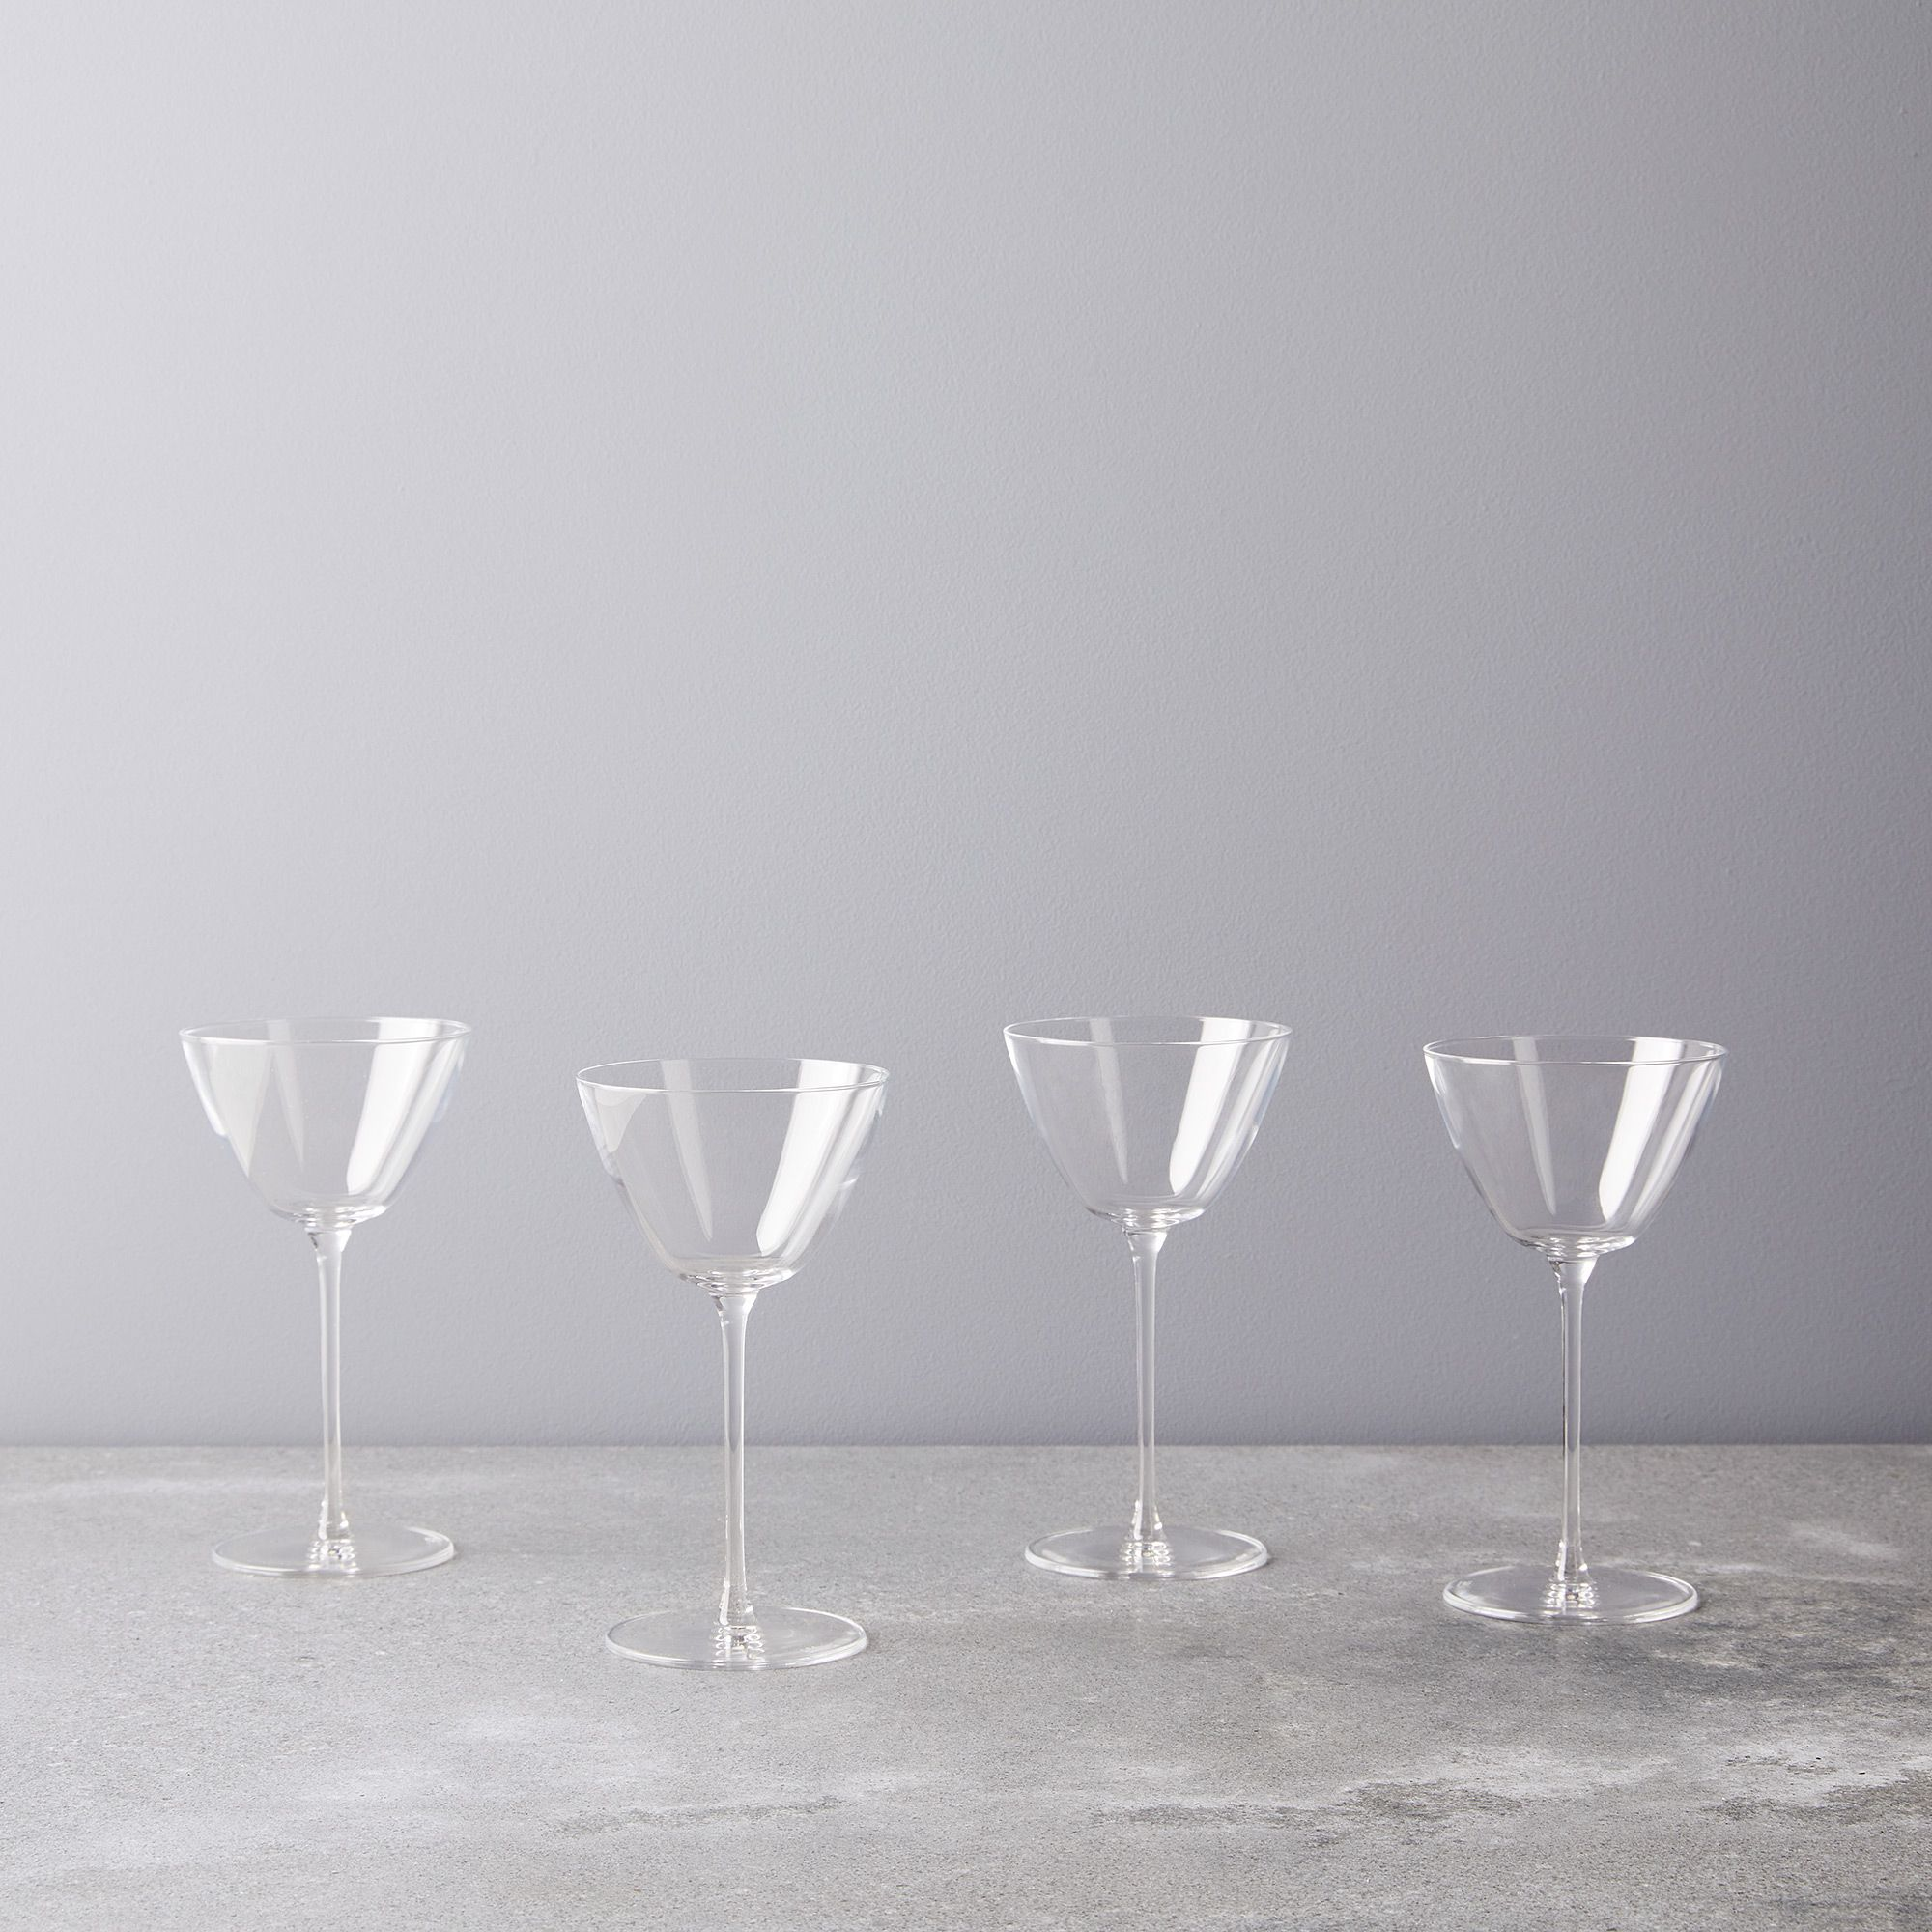 Glassware by Byron Pugh